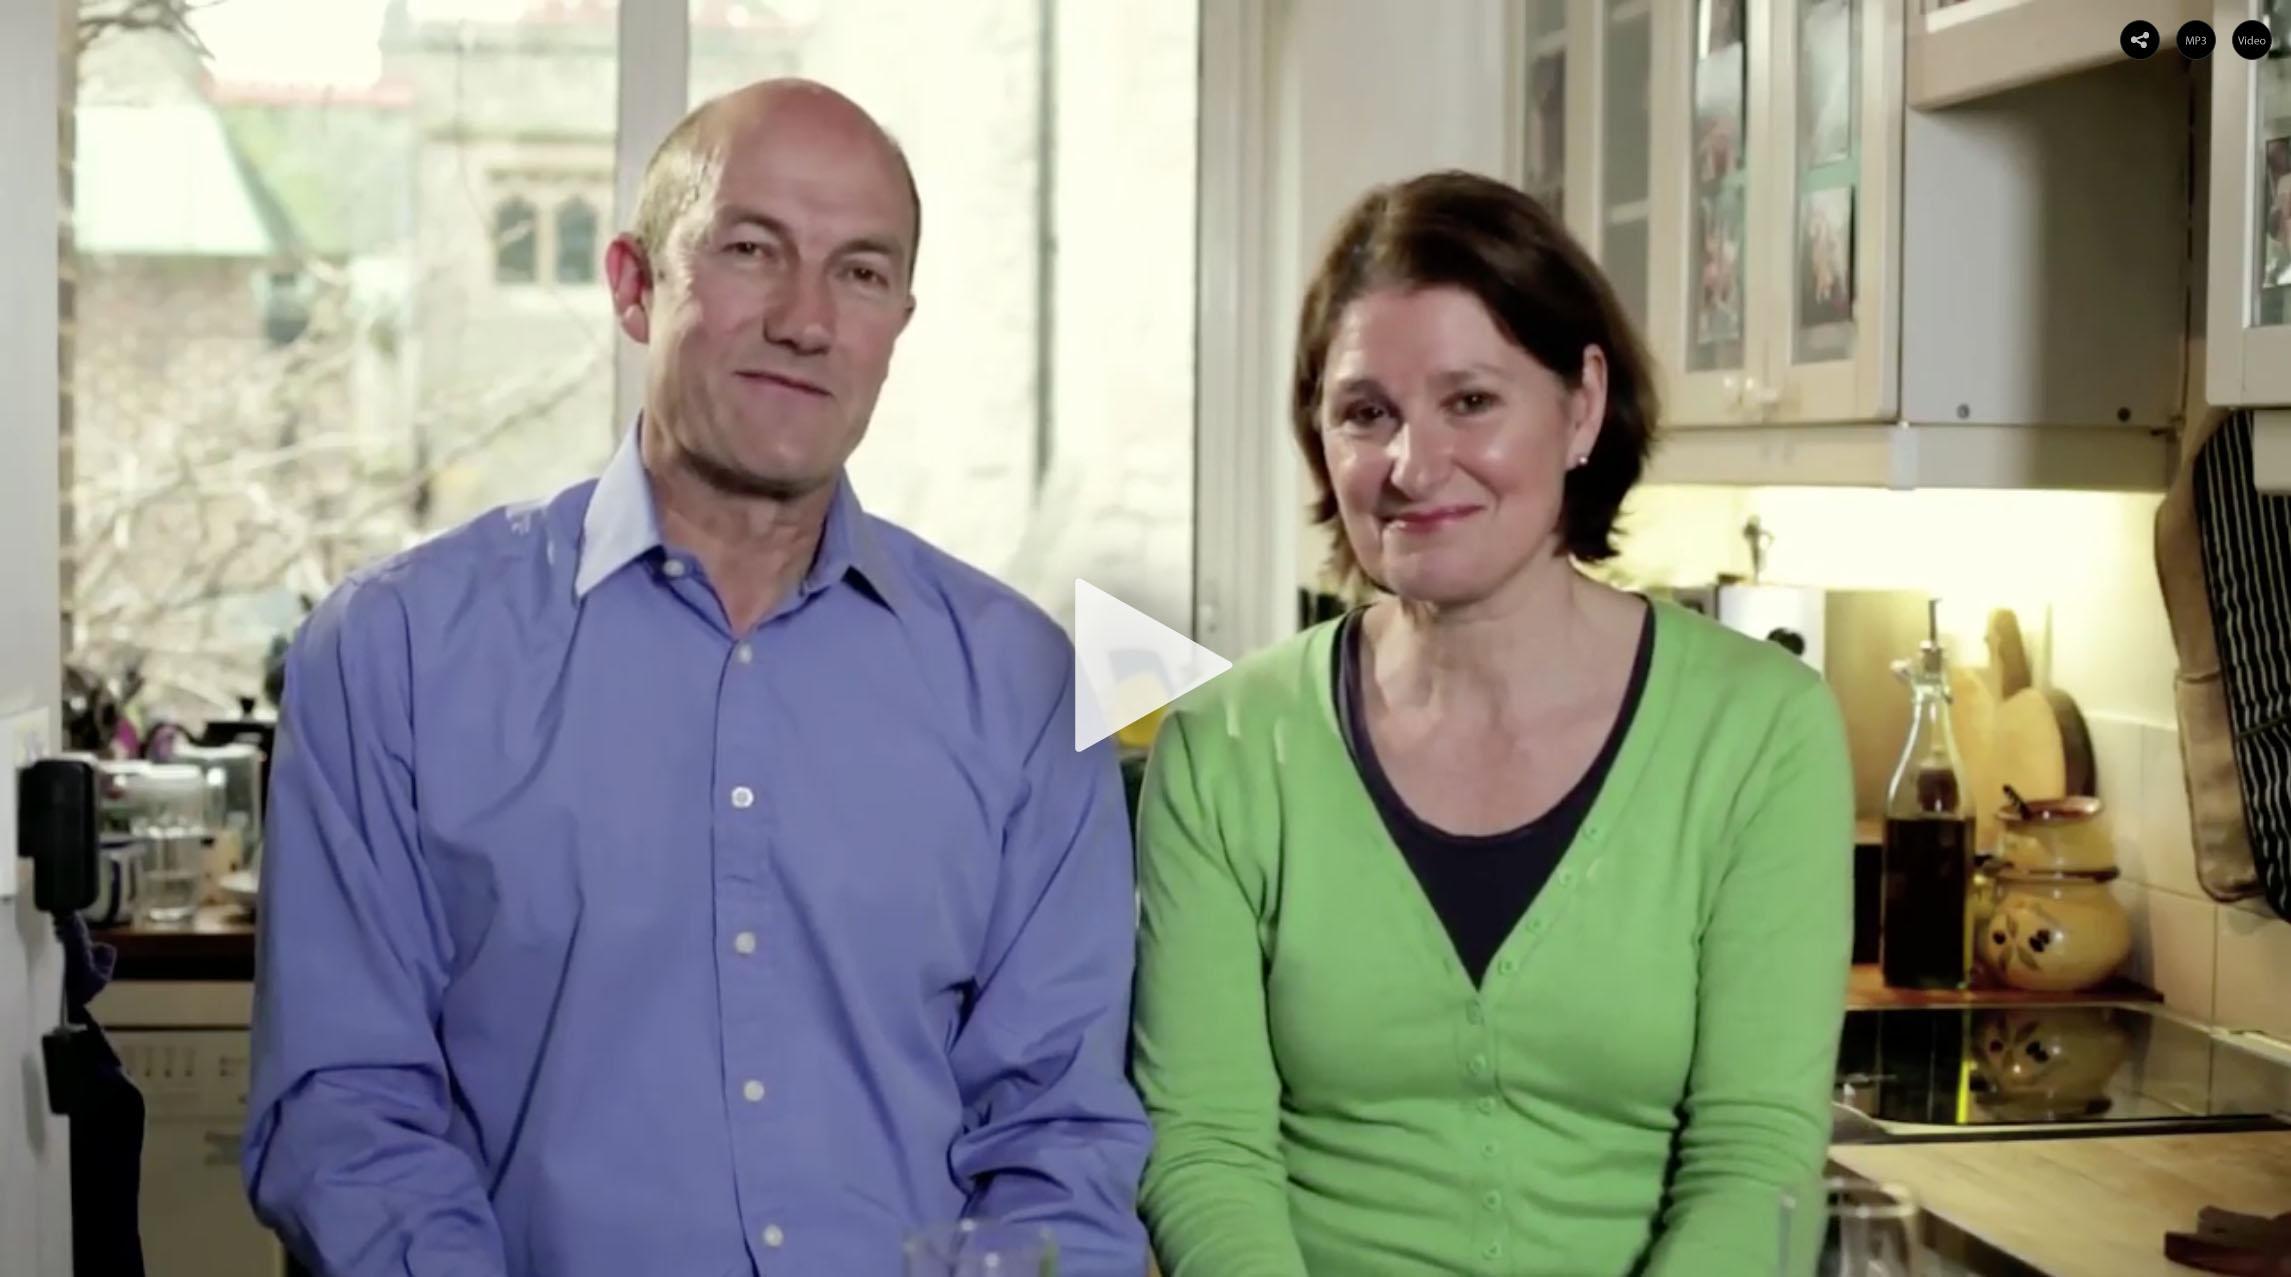 couples-survey-video-thumb.jpg